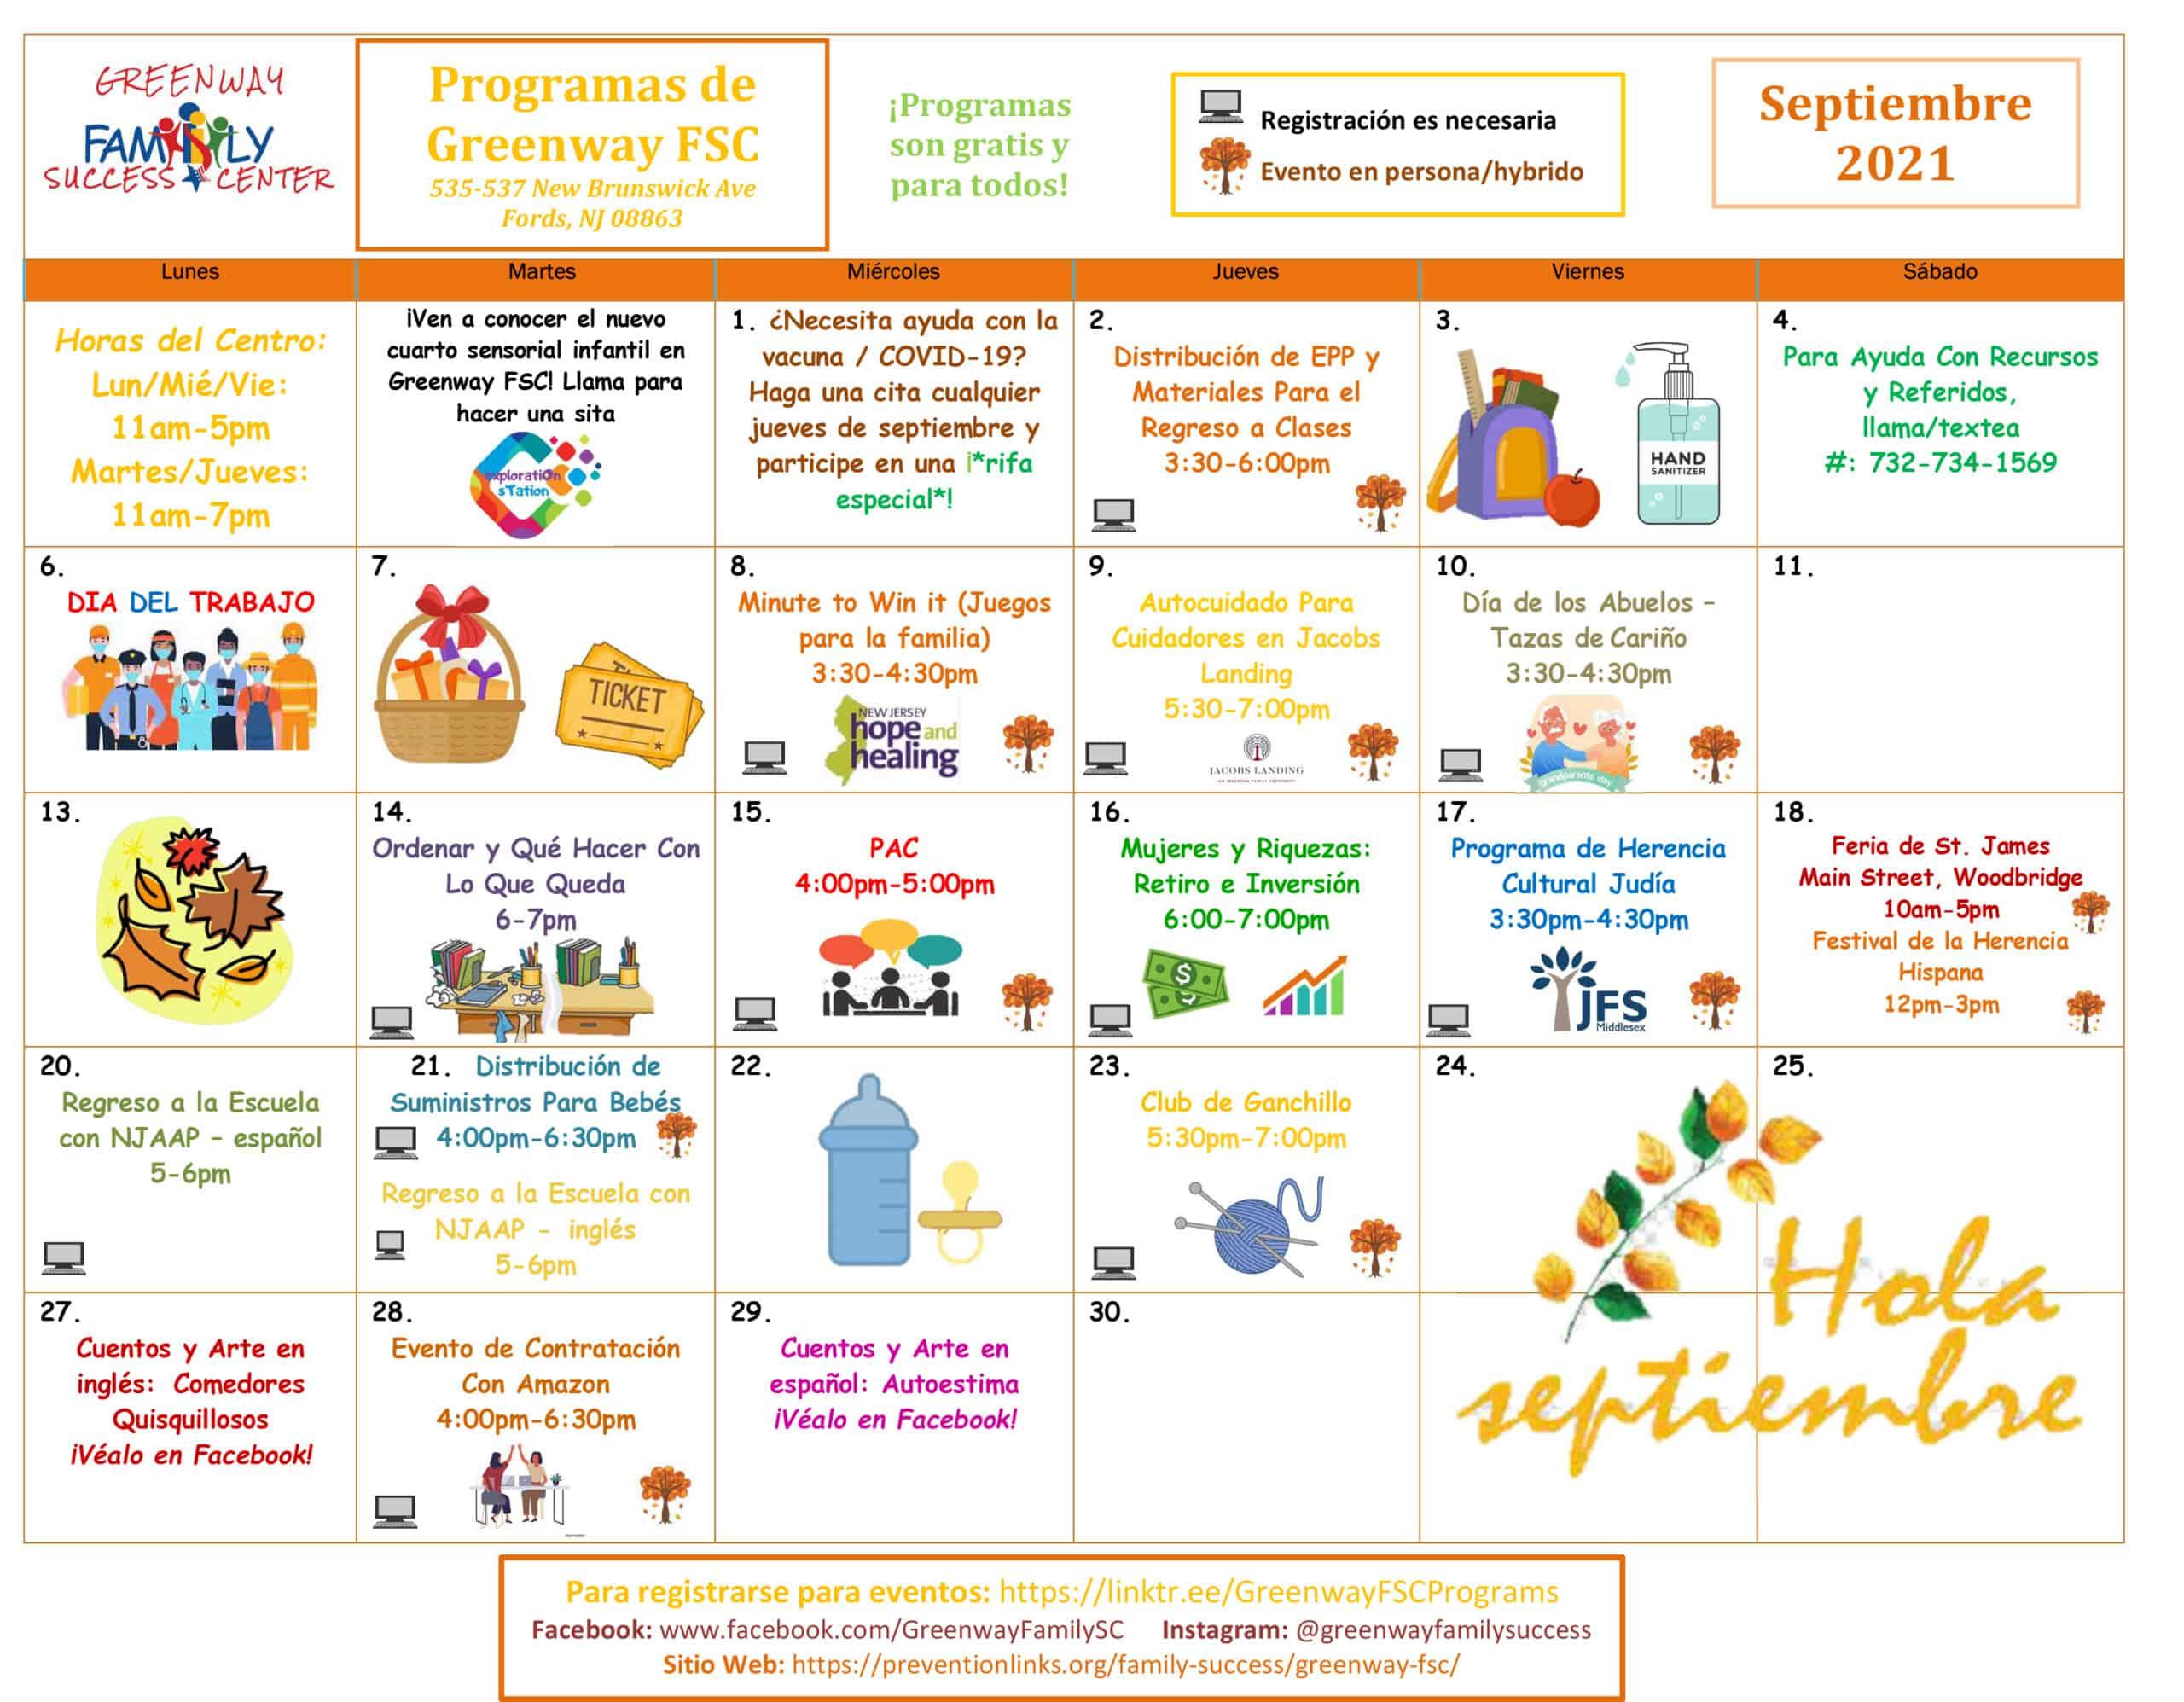 Microsoft Word - Greenway September 2021 Programs Spanish